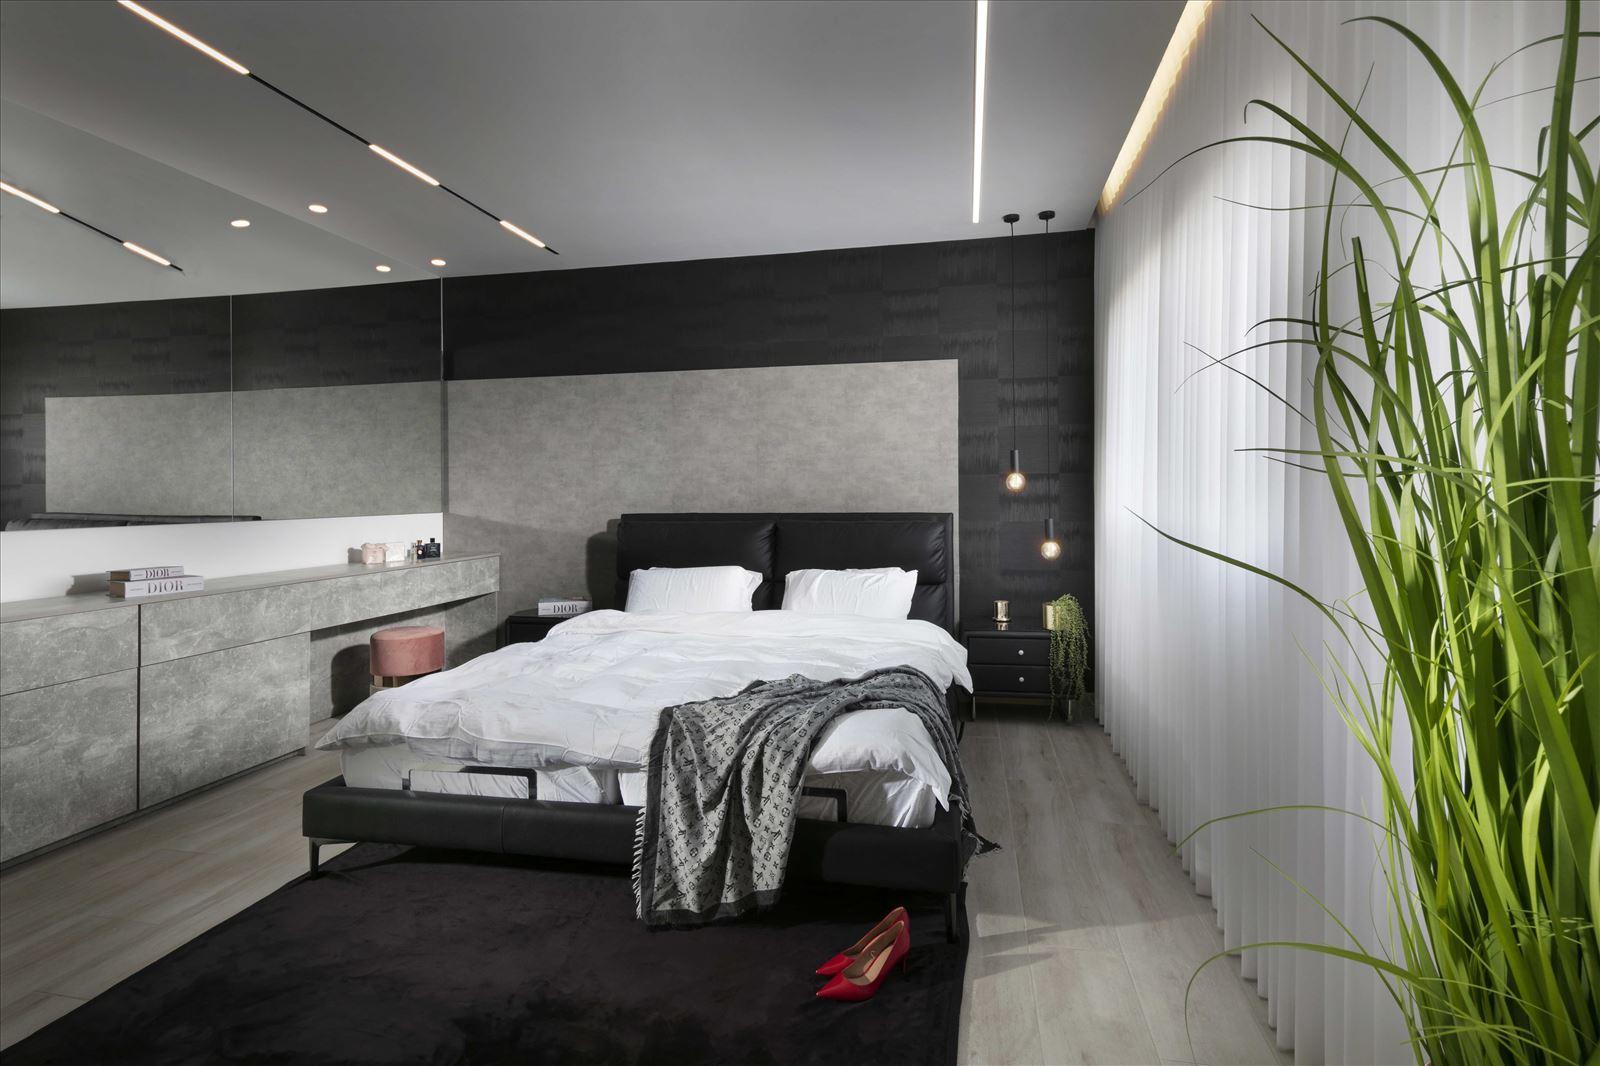 Lighting project private house התקנת תאורה בחדר השינה על ידי קמחי תאורה